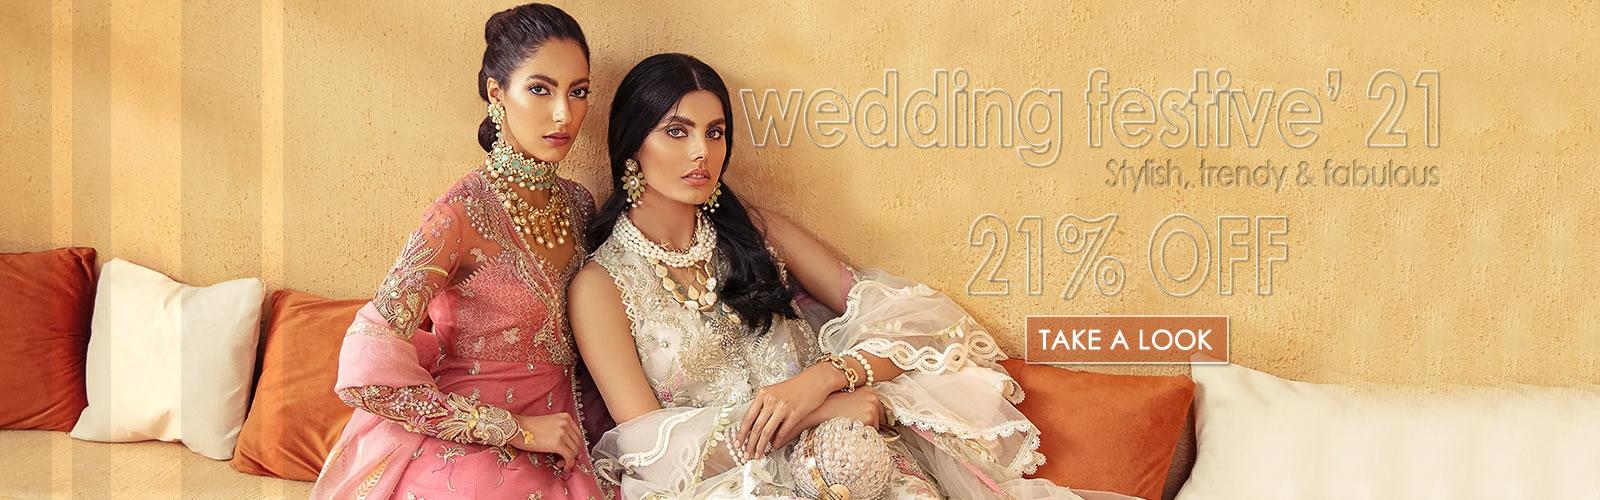 Freeshia Wedding Festive 2021 Collection